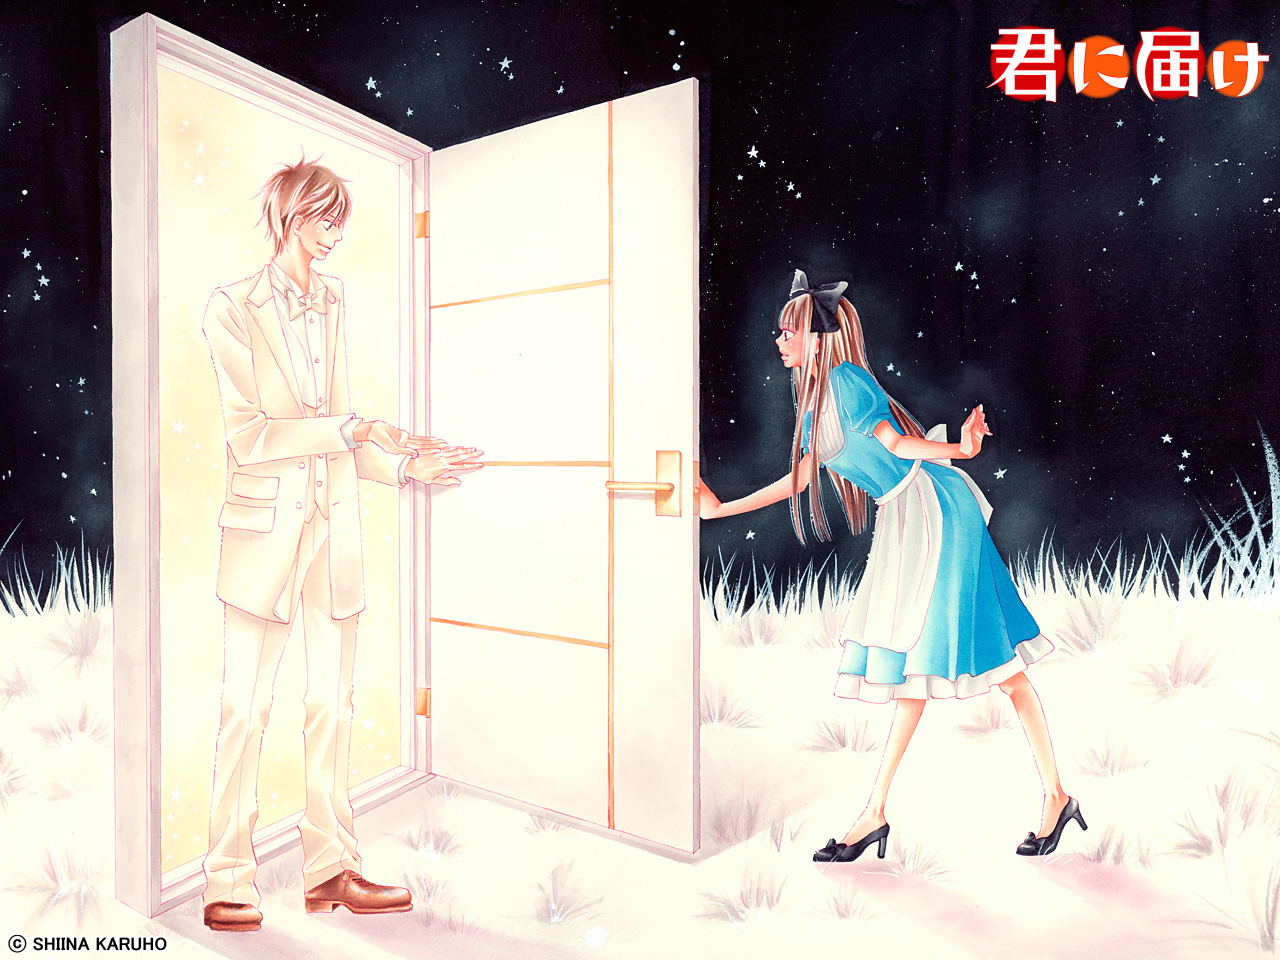 Kimi Ni Todoke From Me To You Wallpaper Zerochan Anime Image Board